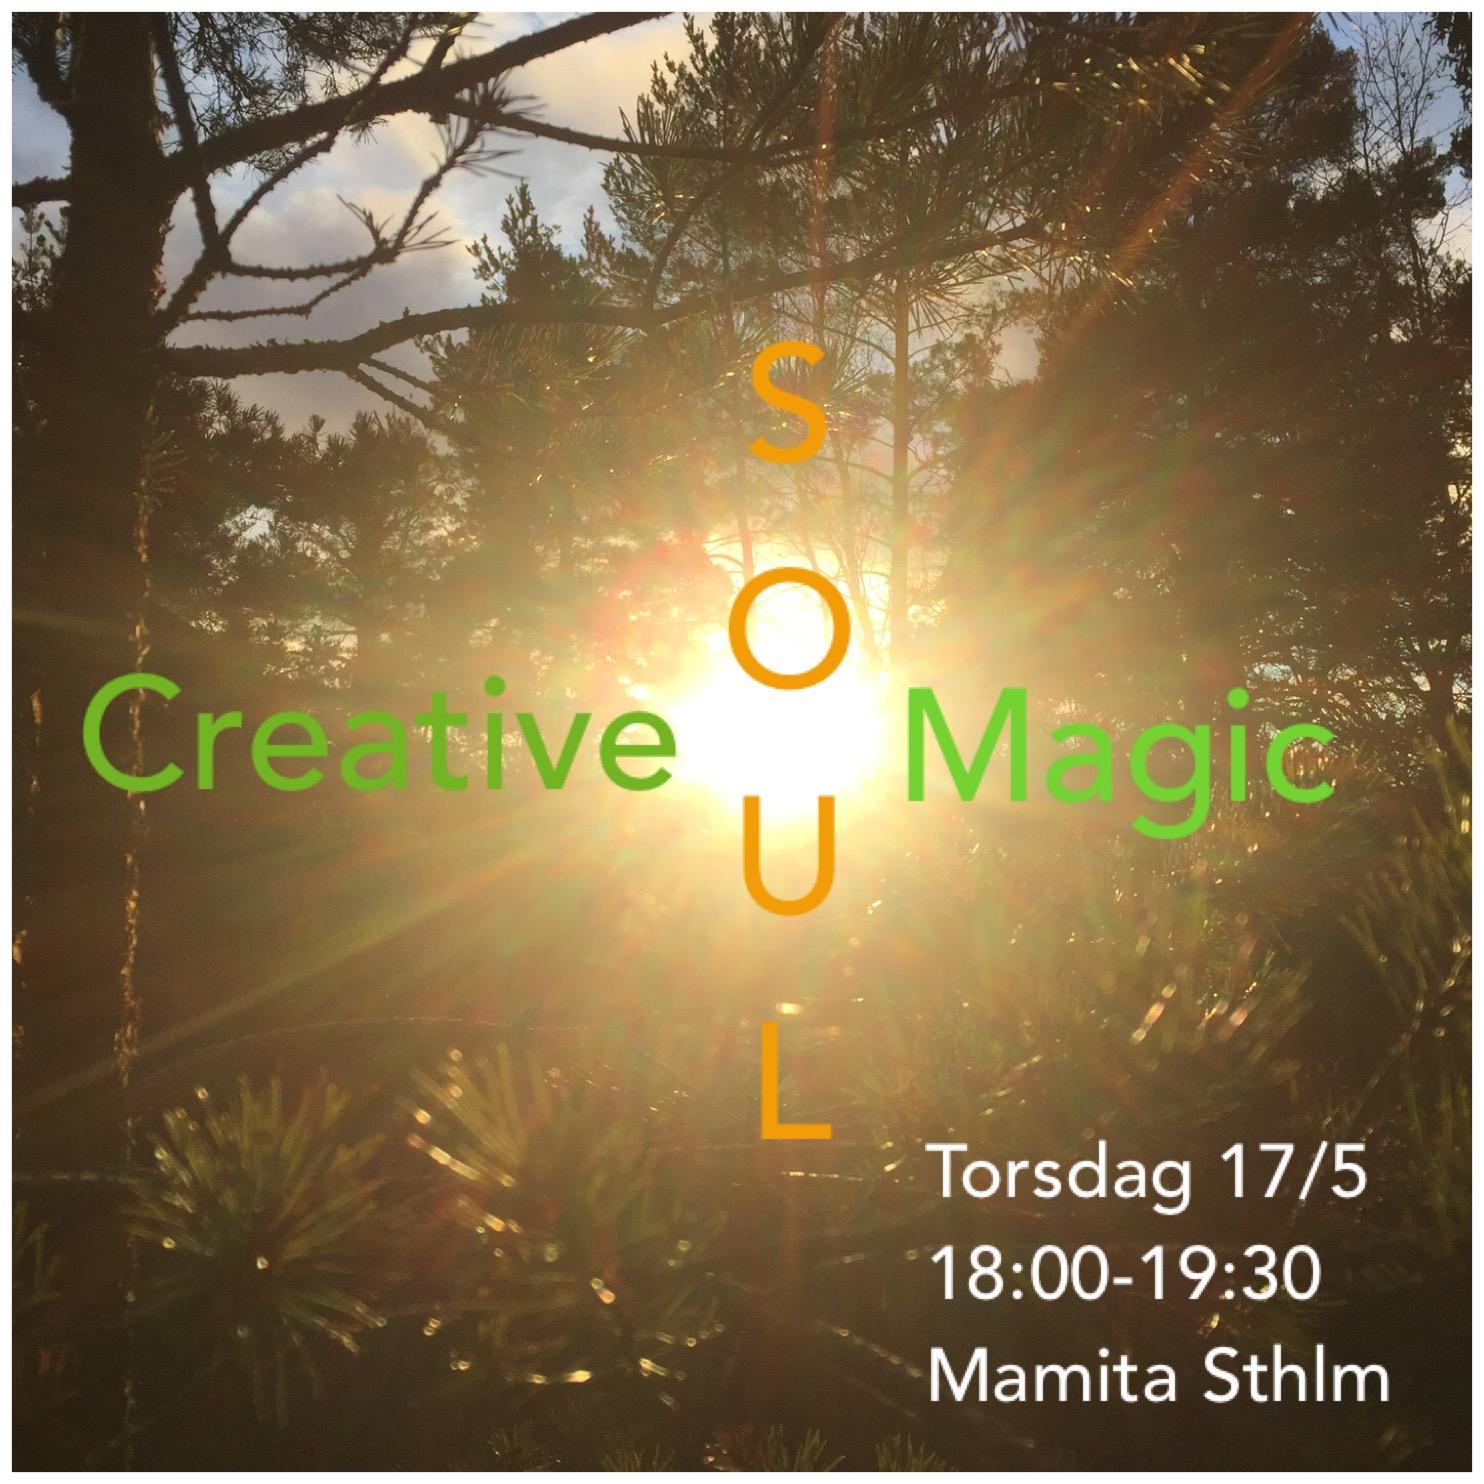 Creative_SoulMagic_17_maj.JPG